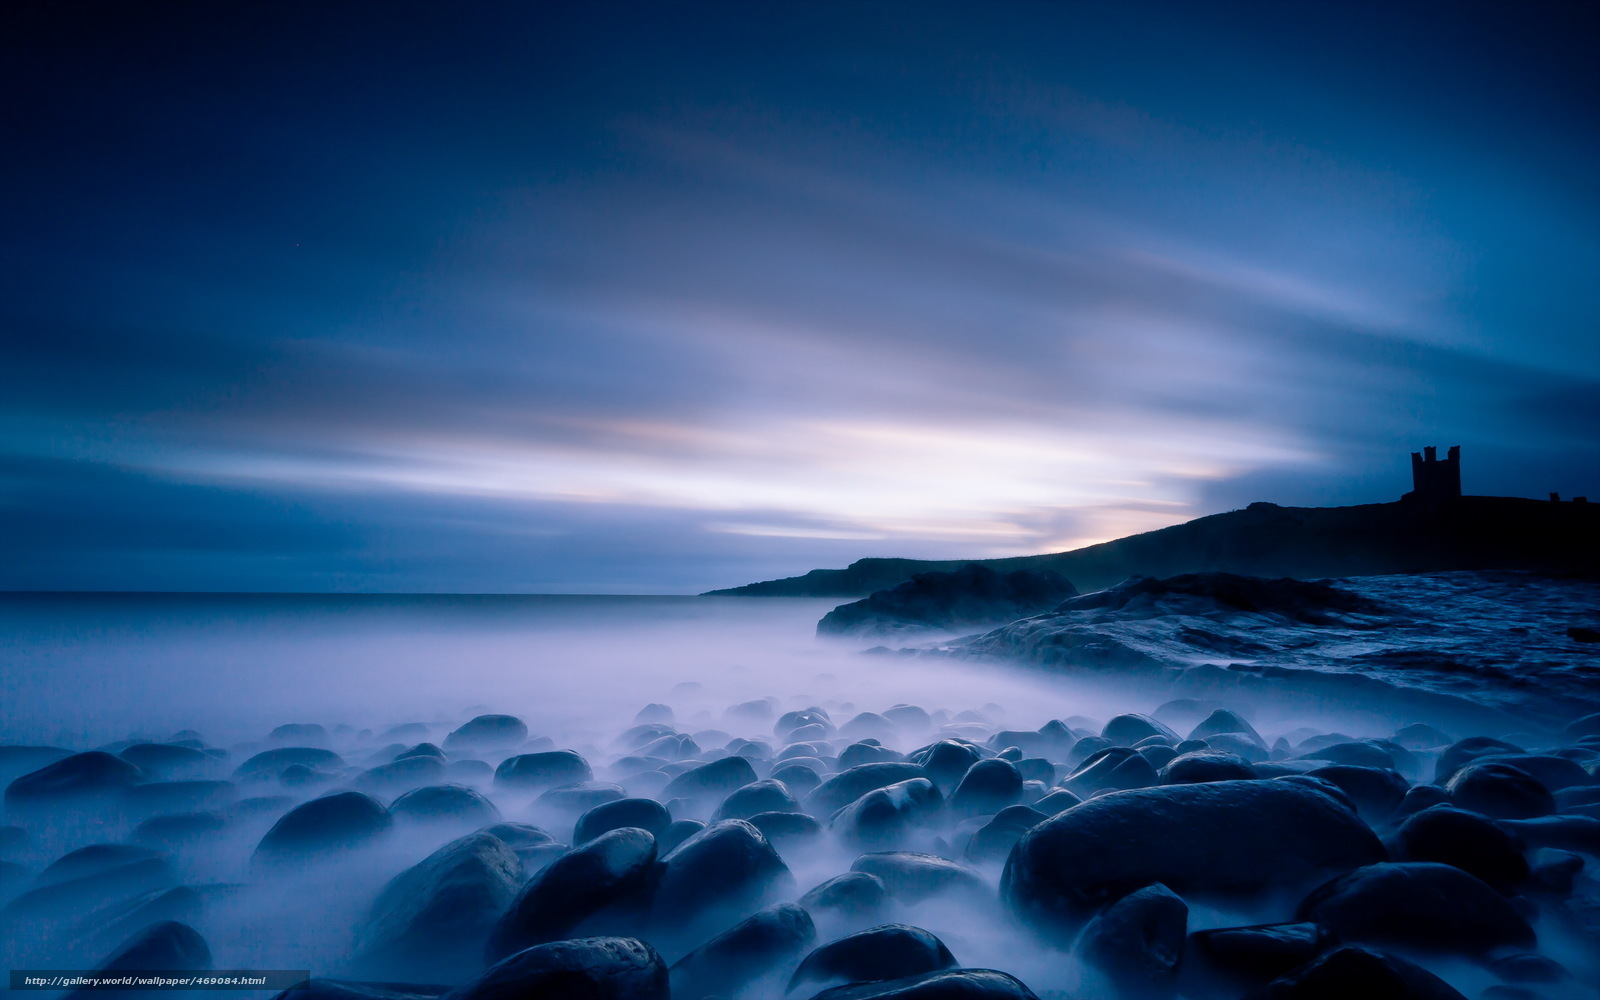 Sea At Night 4K HD Desktop Wallpaper for 4K Ultra HD TV